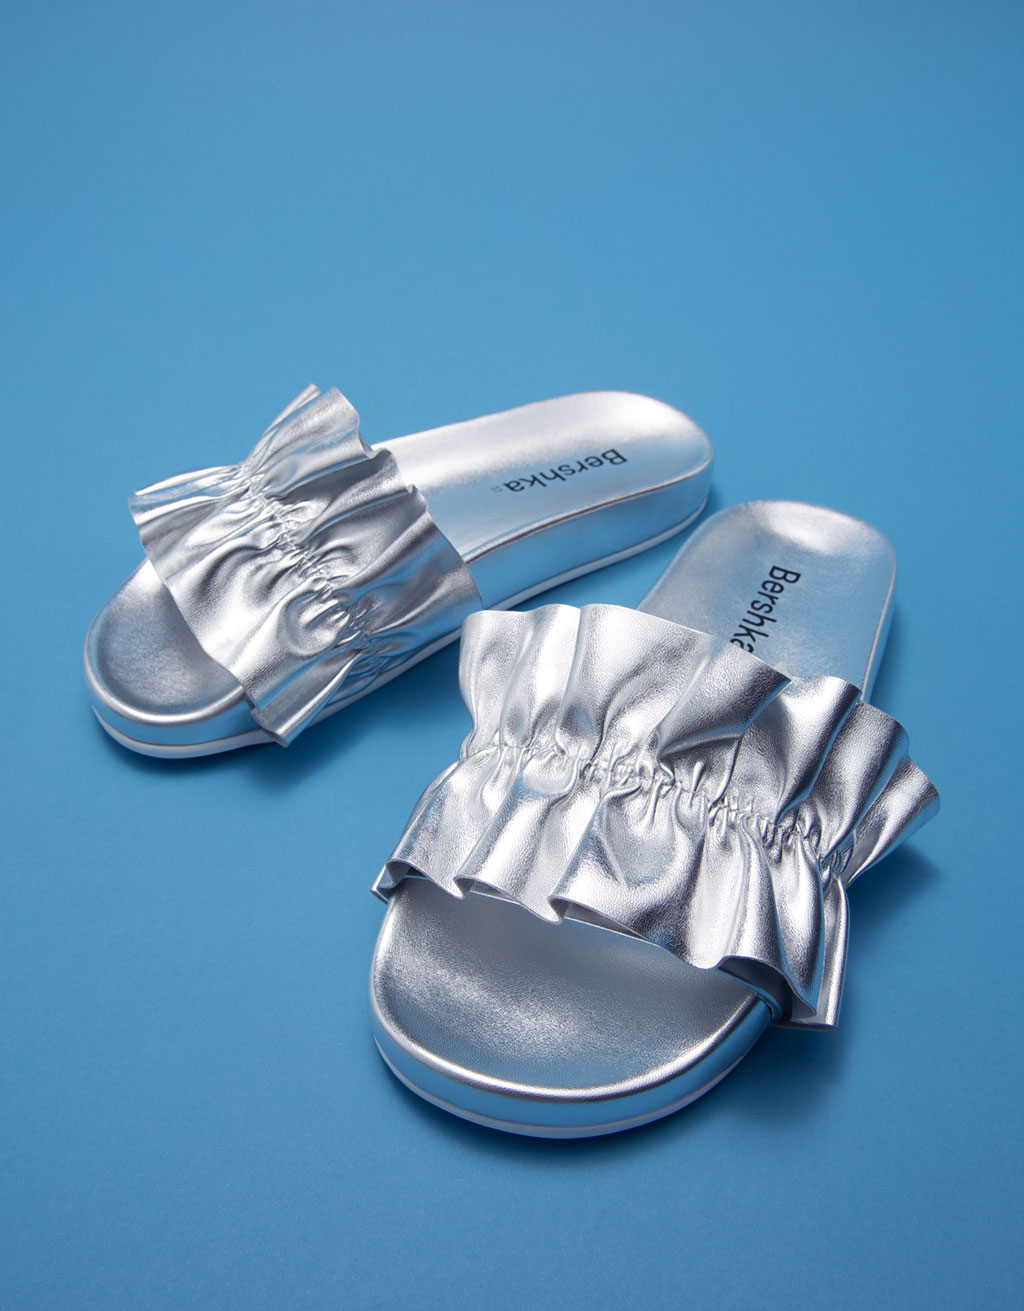 Shiny slides with metallic frills